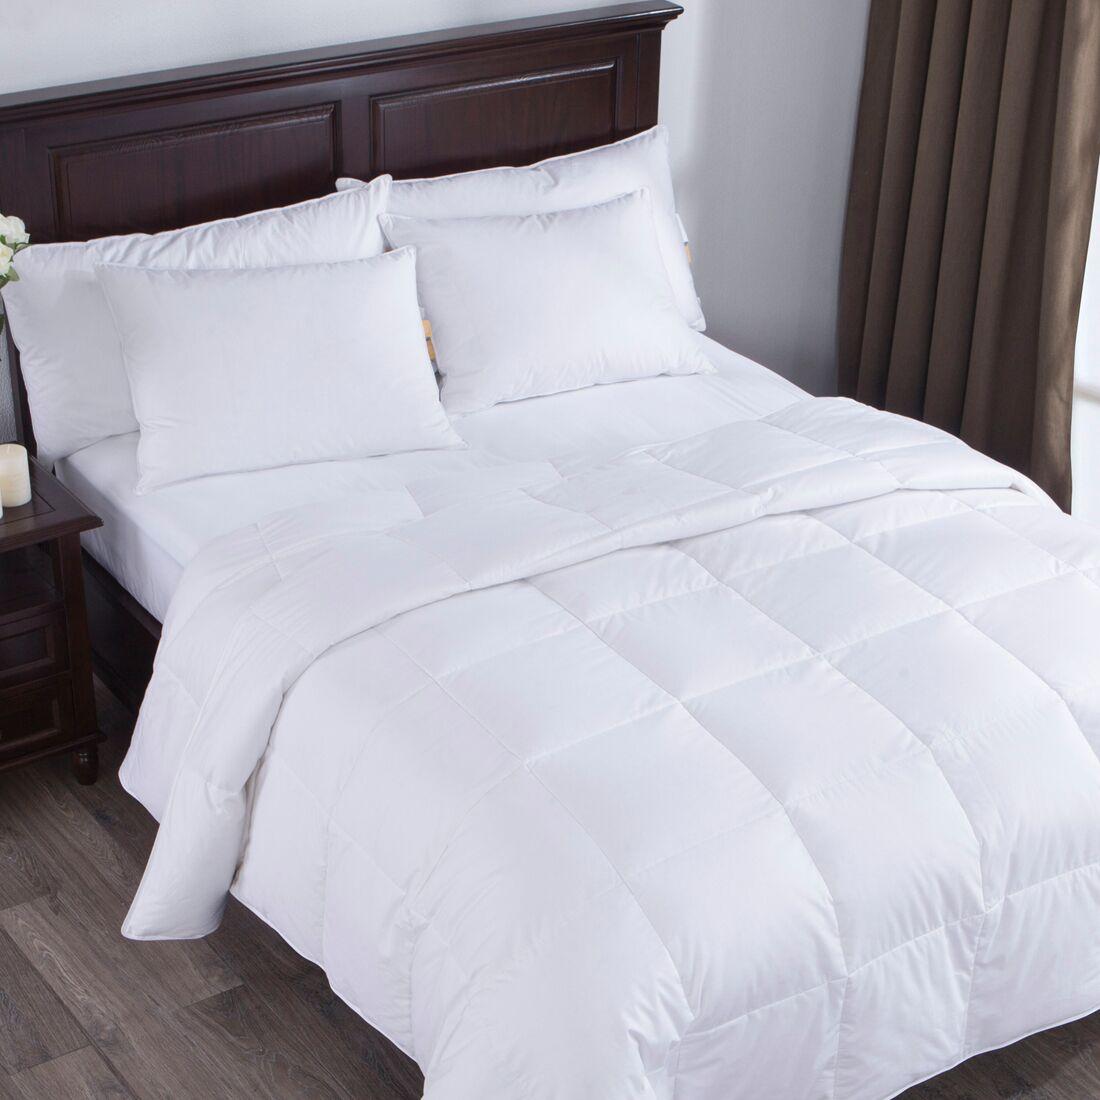 Lightweight Down Comforter Size: Full/Queen